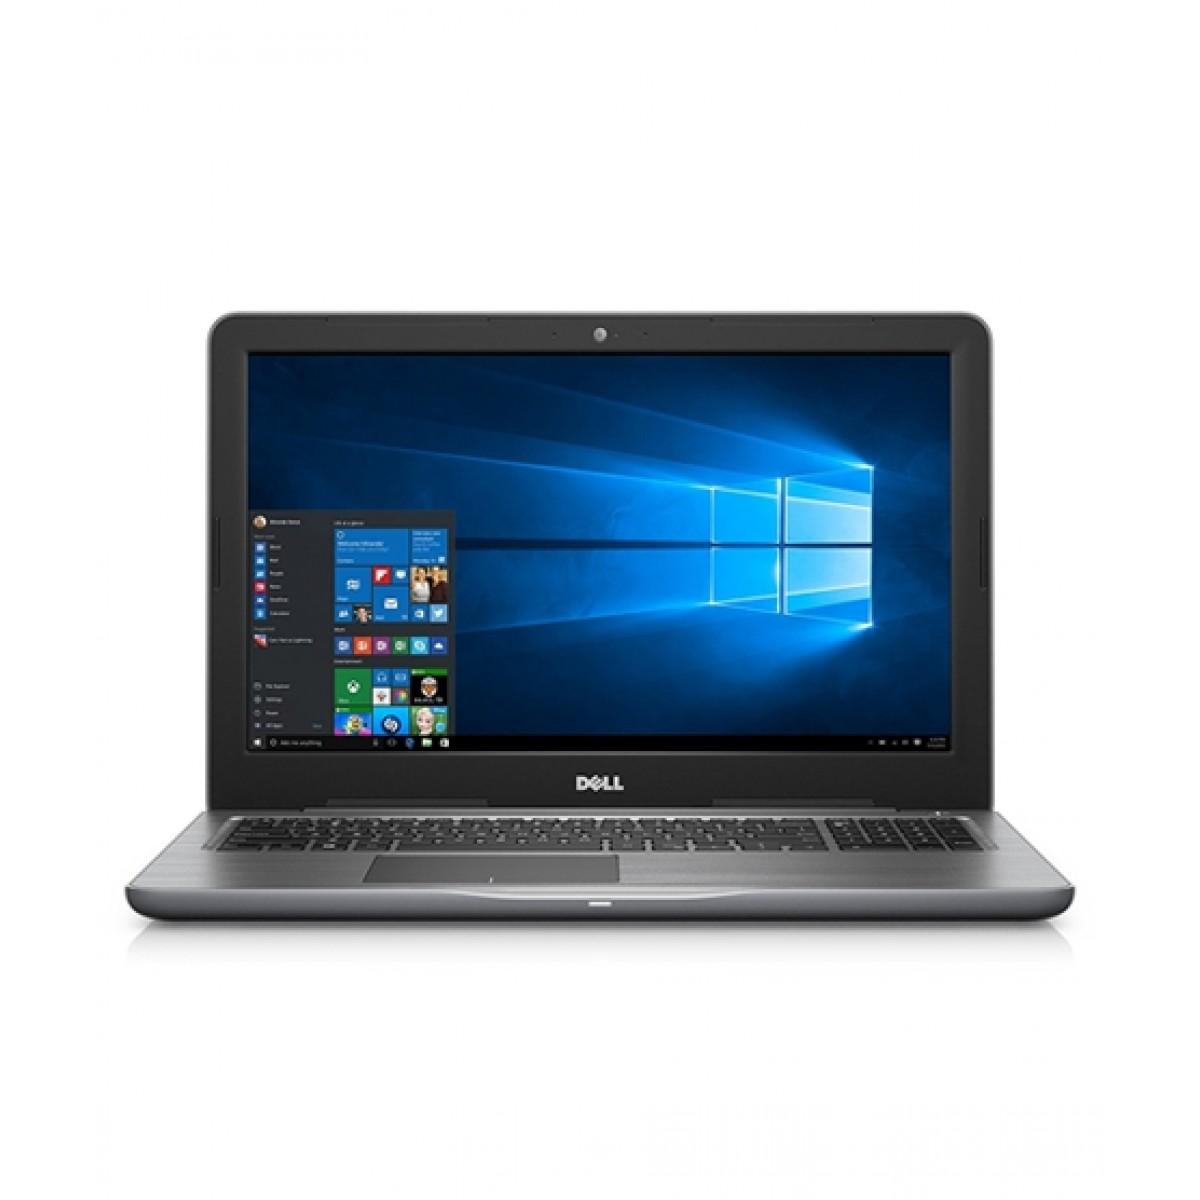 Dell Inspiron 15 AMD FX 9800P Laptop Price In Pakistan